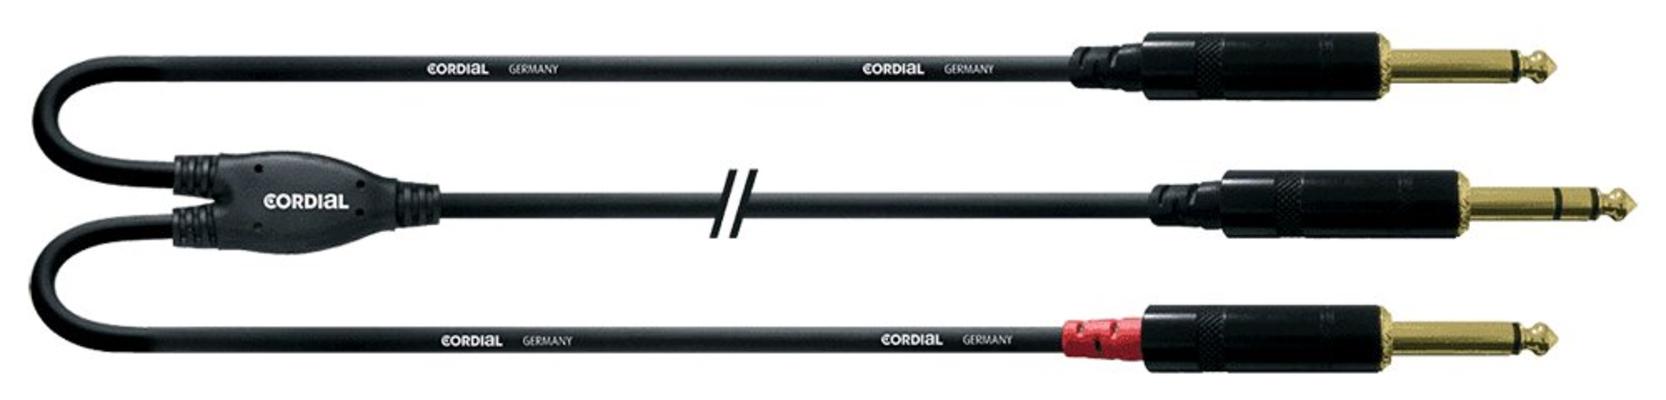 Cordial CFY 3 VPP Jack stereo 6.3mm  2x Jack mono 6.3mm, 3m